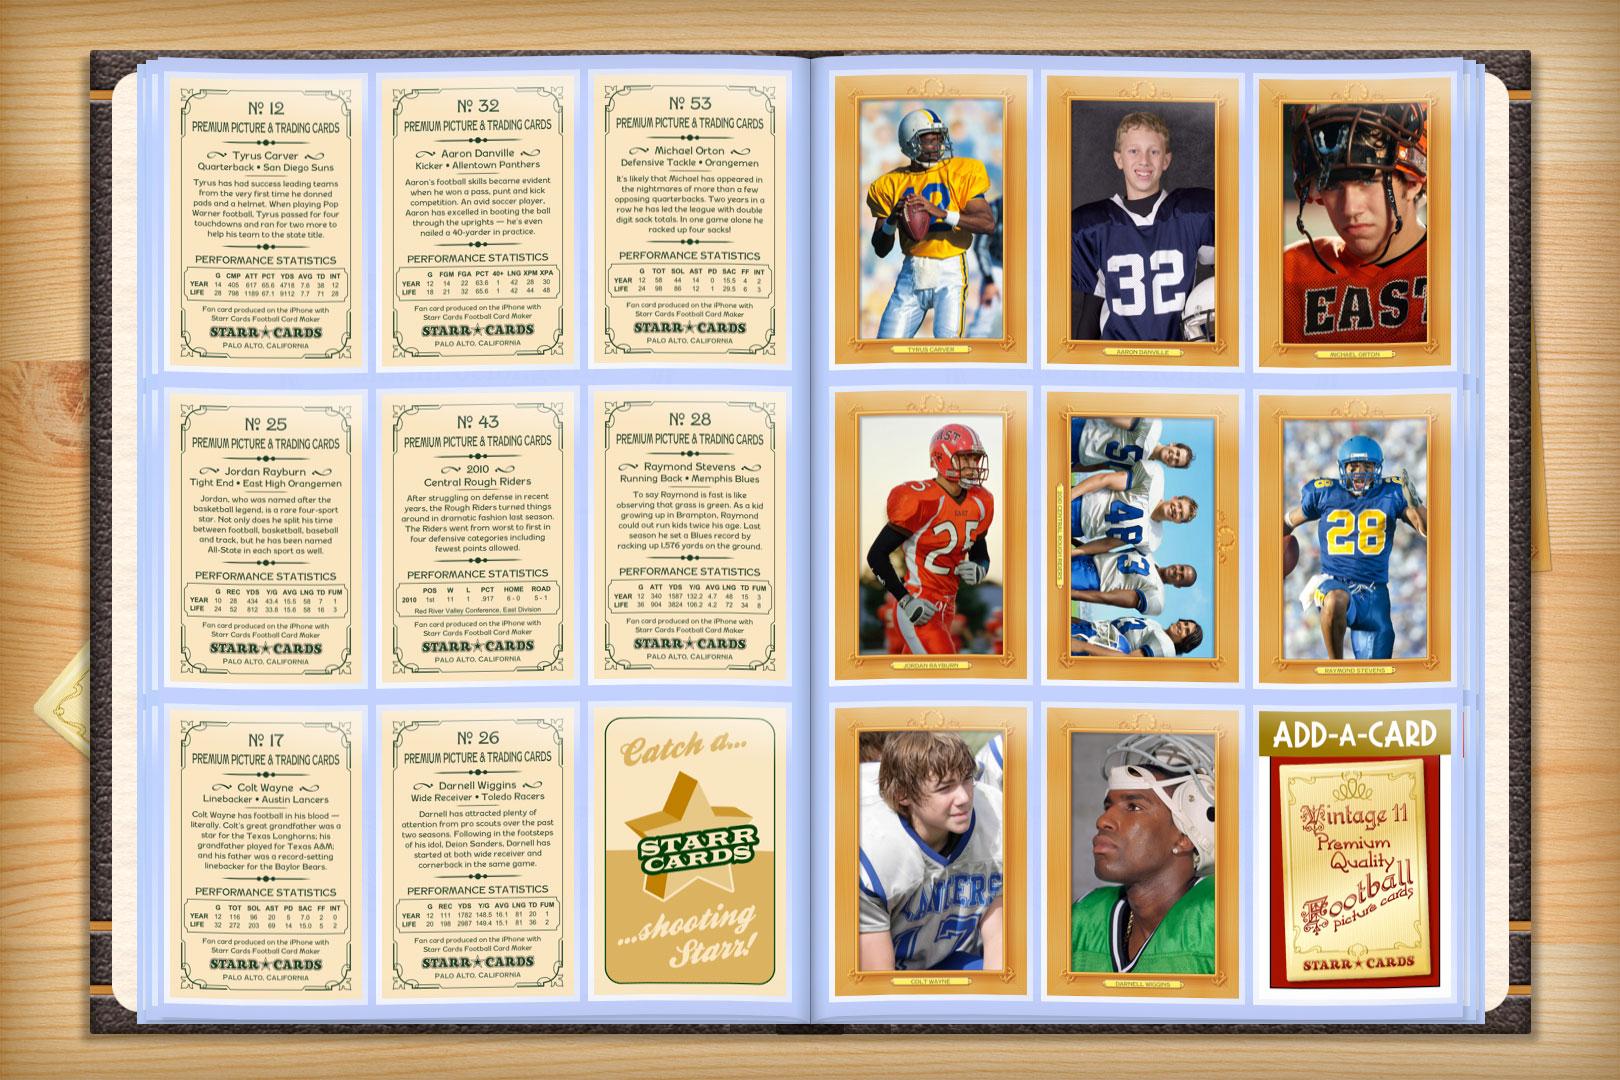 custom football cards vintage 11 series starr cards